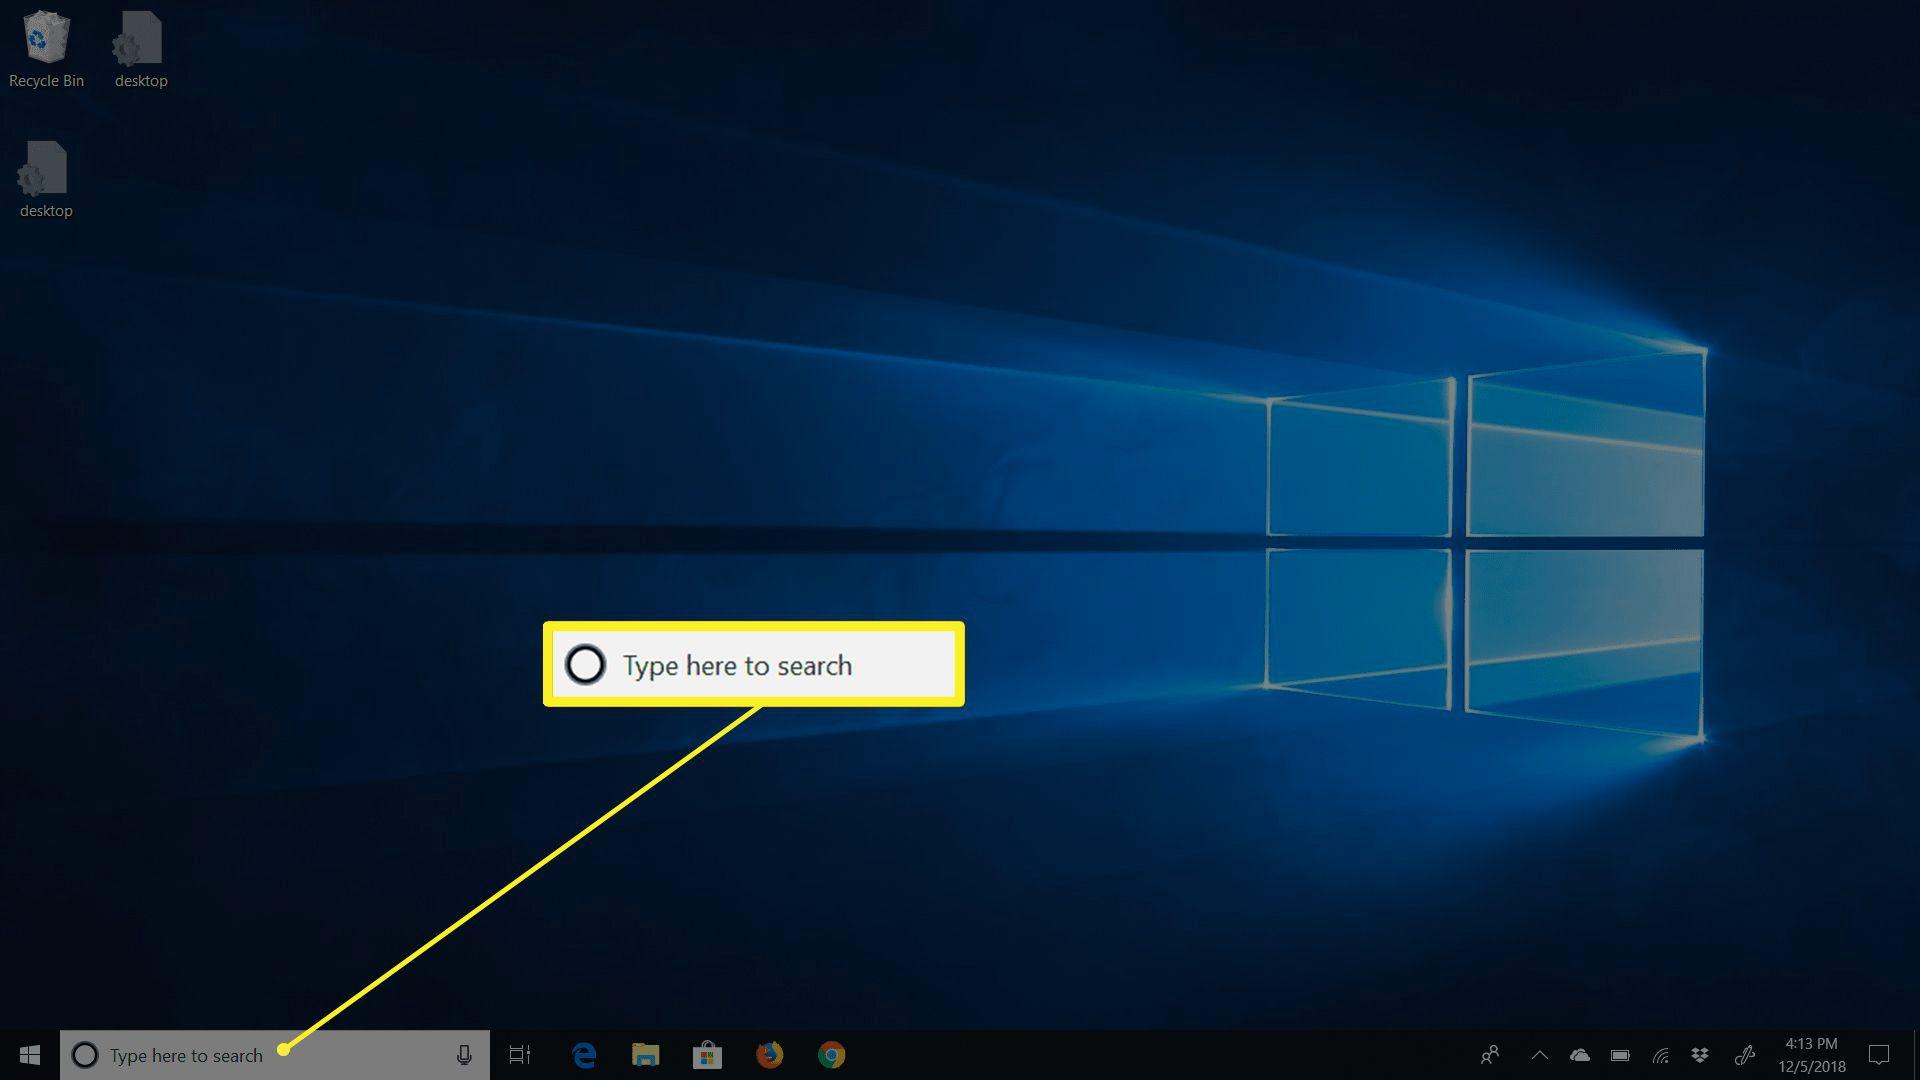 The search box on Windows 10 desktop